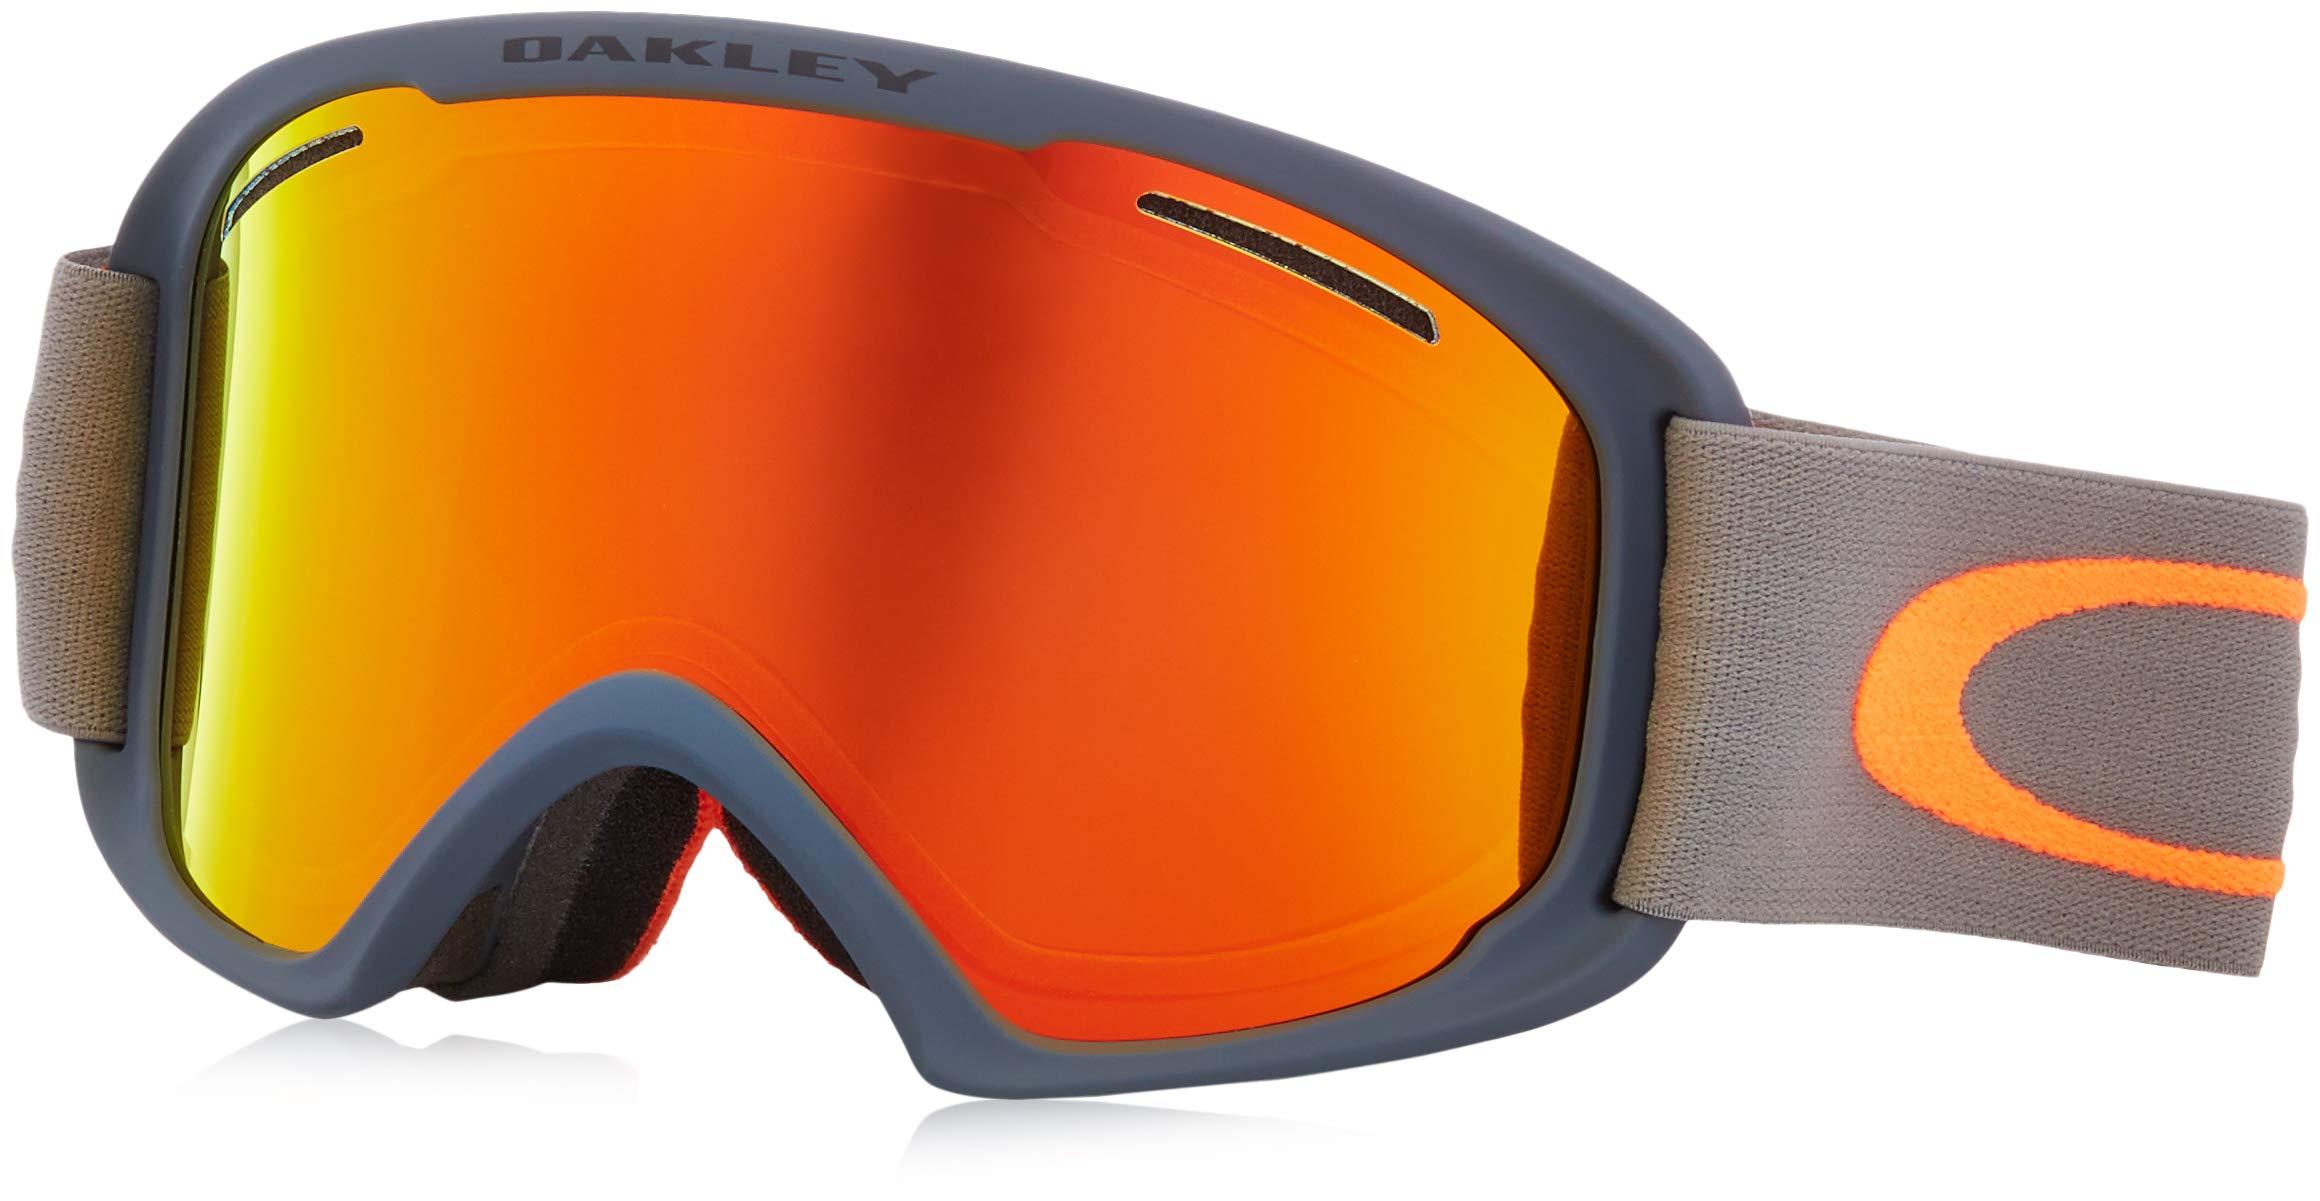 Oakley O Frame 2.0 Snow Goggle, Forged Iron Brush, Large